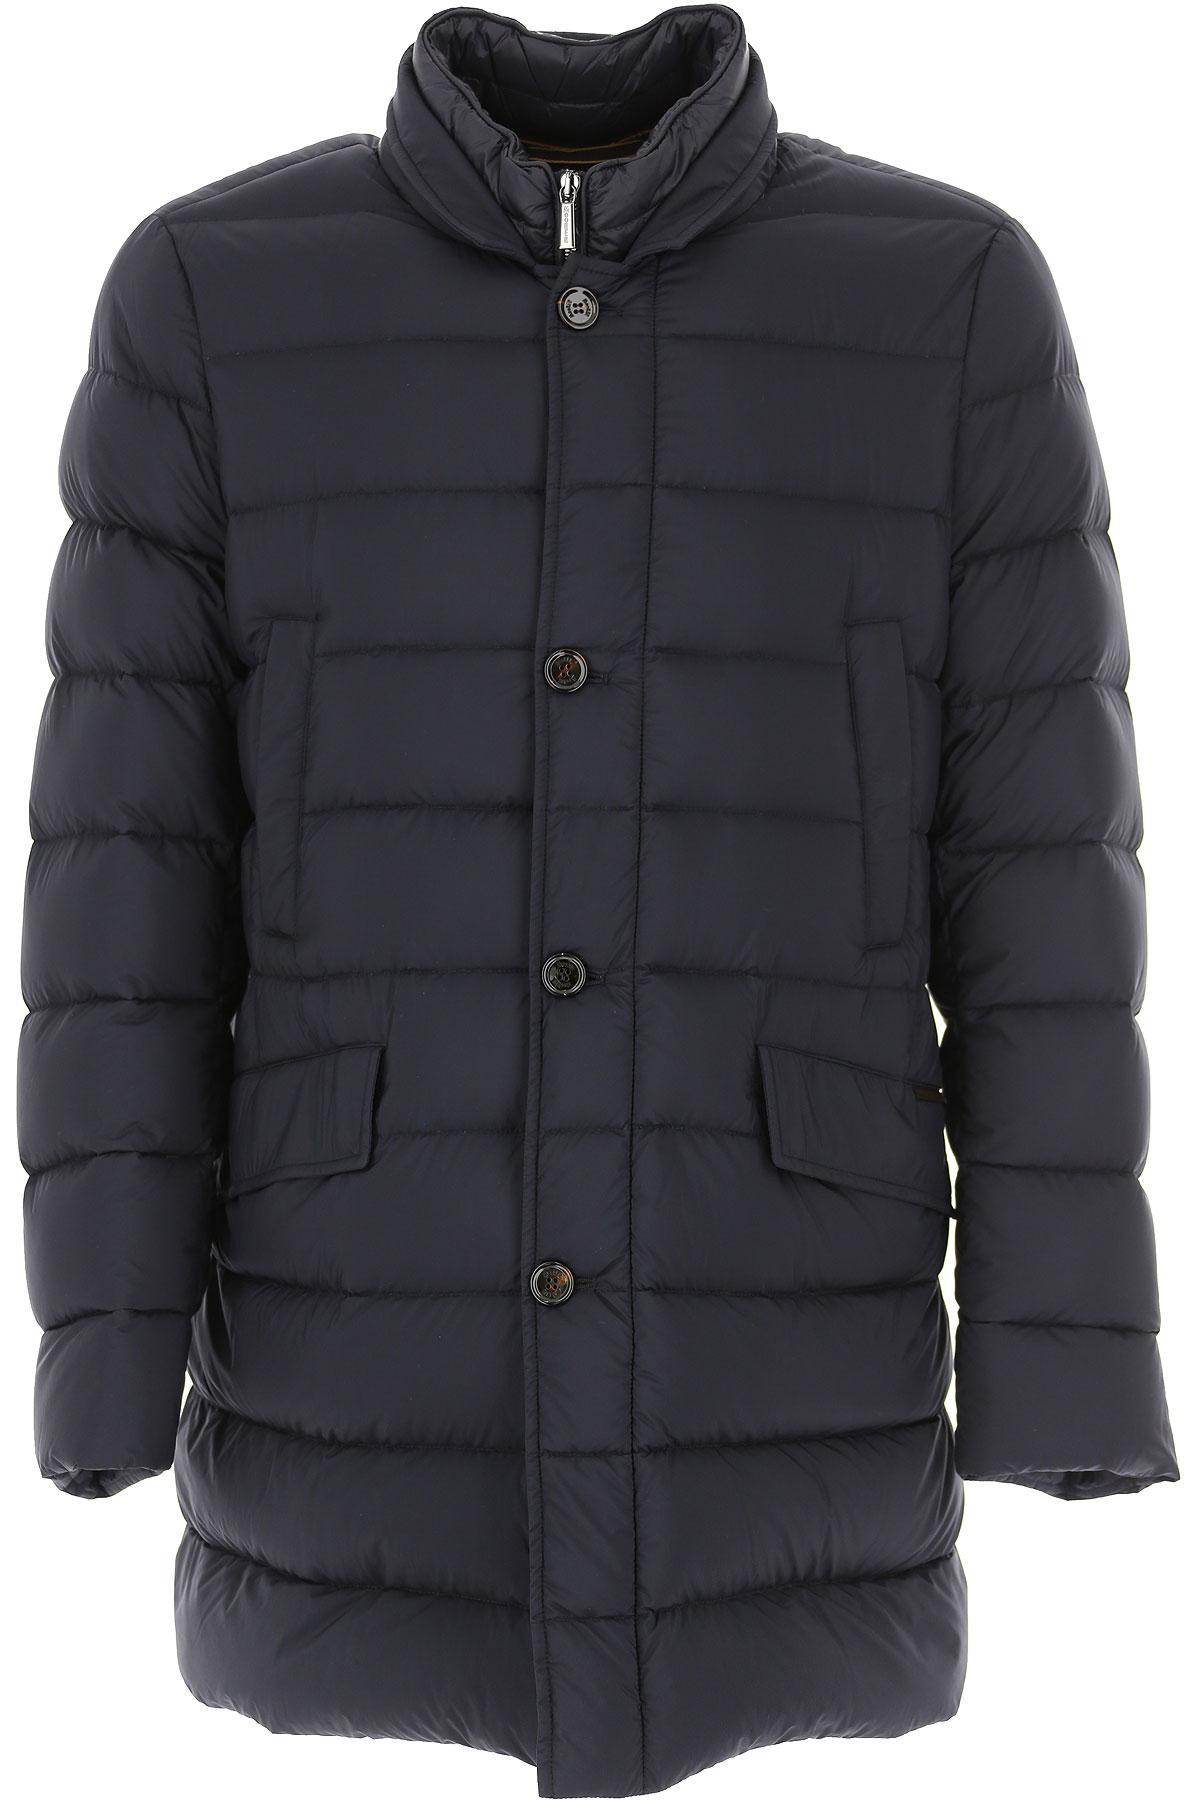 Moorer Down Jacket for Men, Puffer Ski Jacket On Sale, Midnight Blue, polyamide, 2019, L M XXL